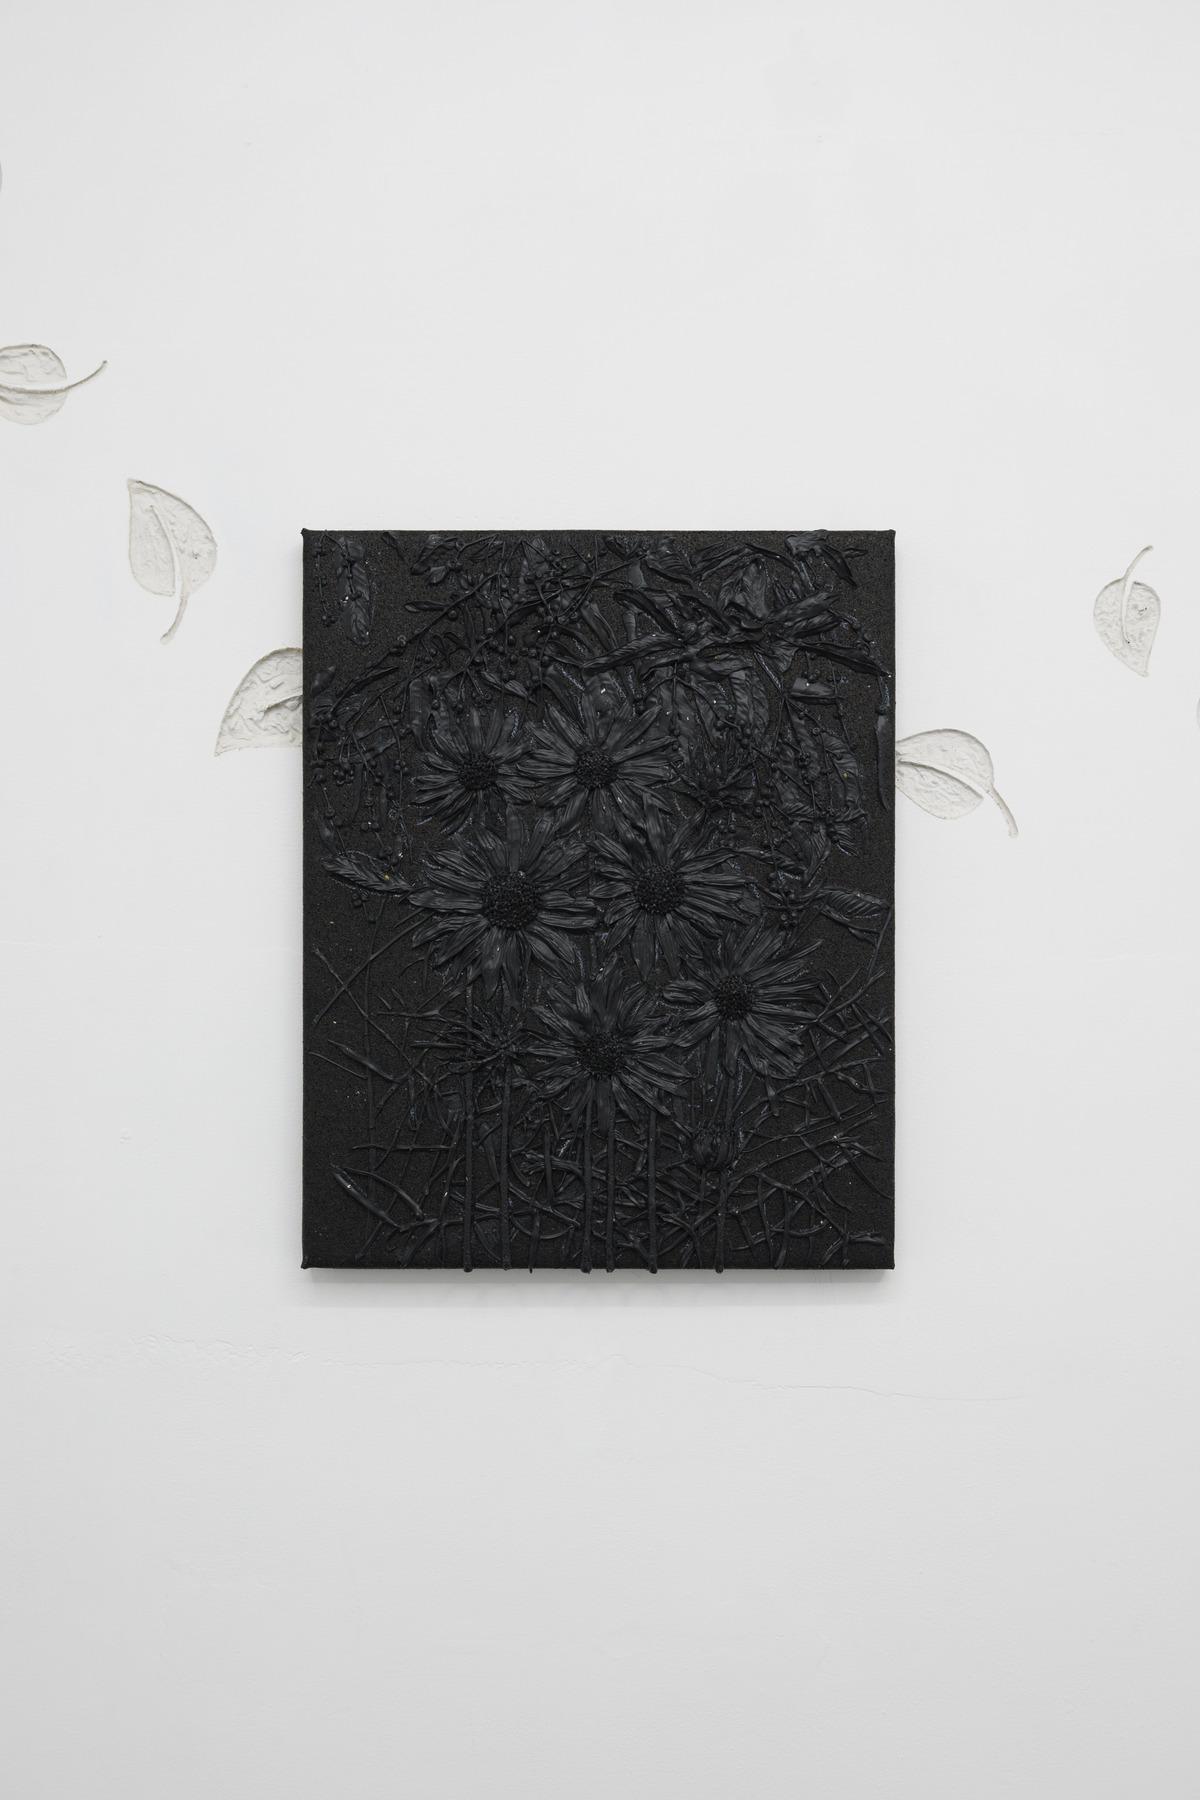 Michael Assiff-Ozone Flowers 11